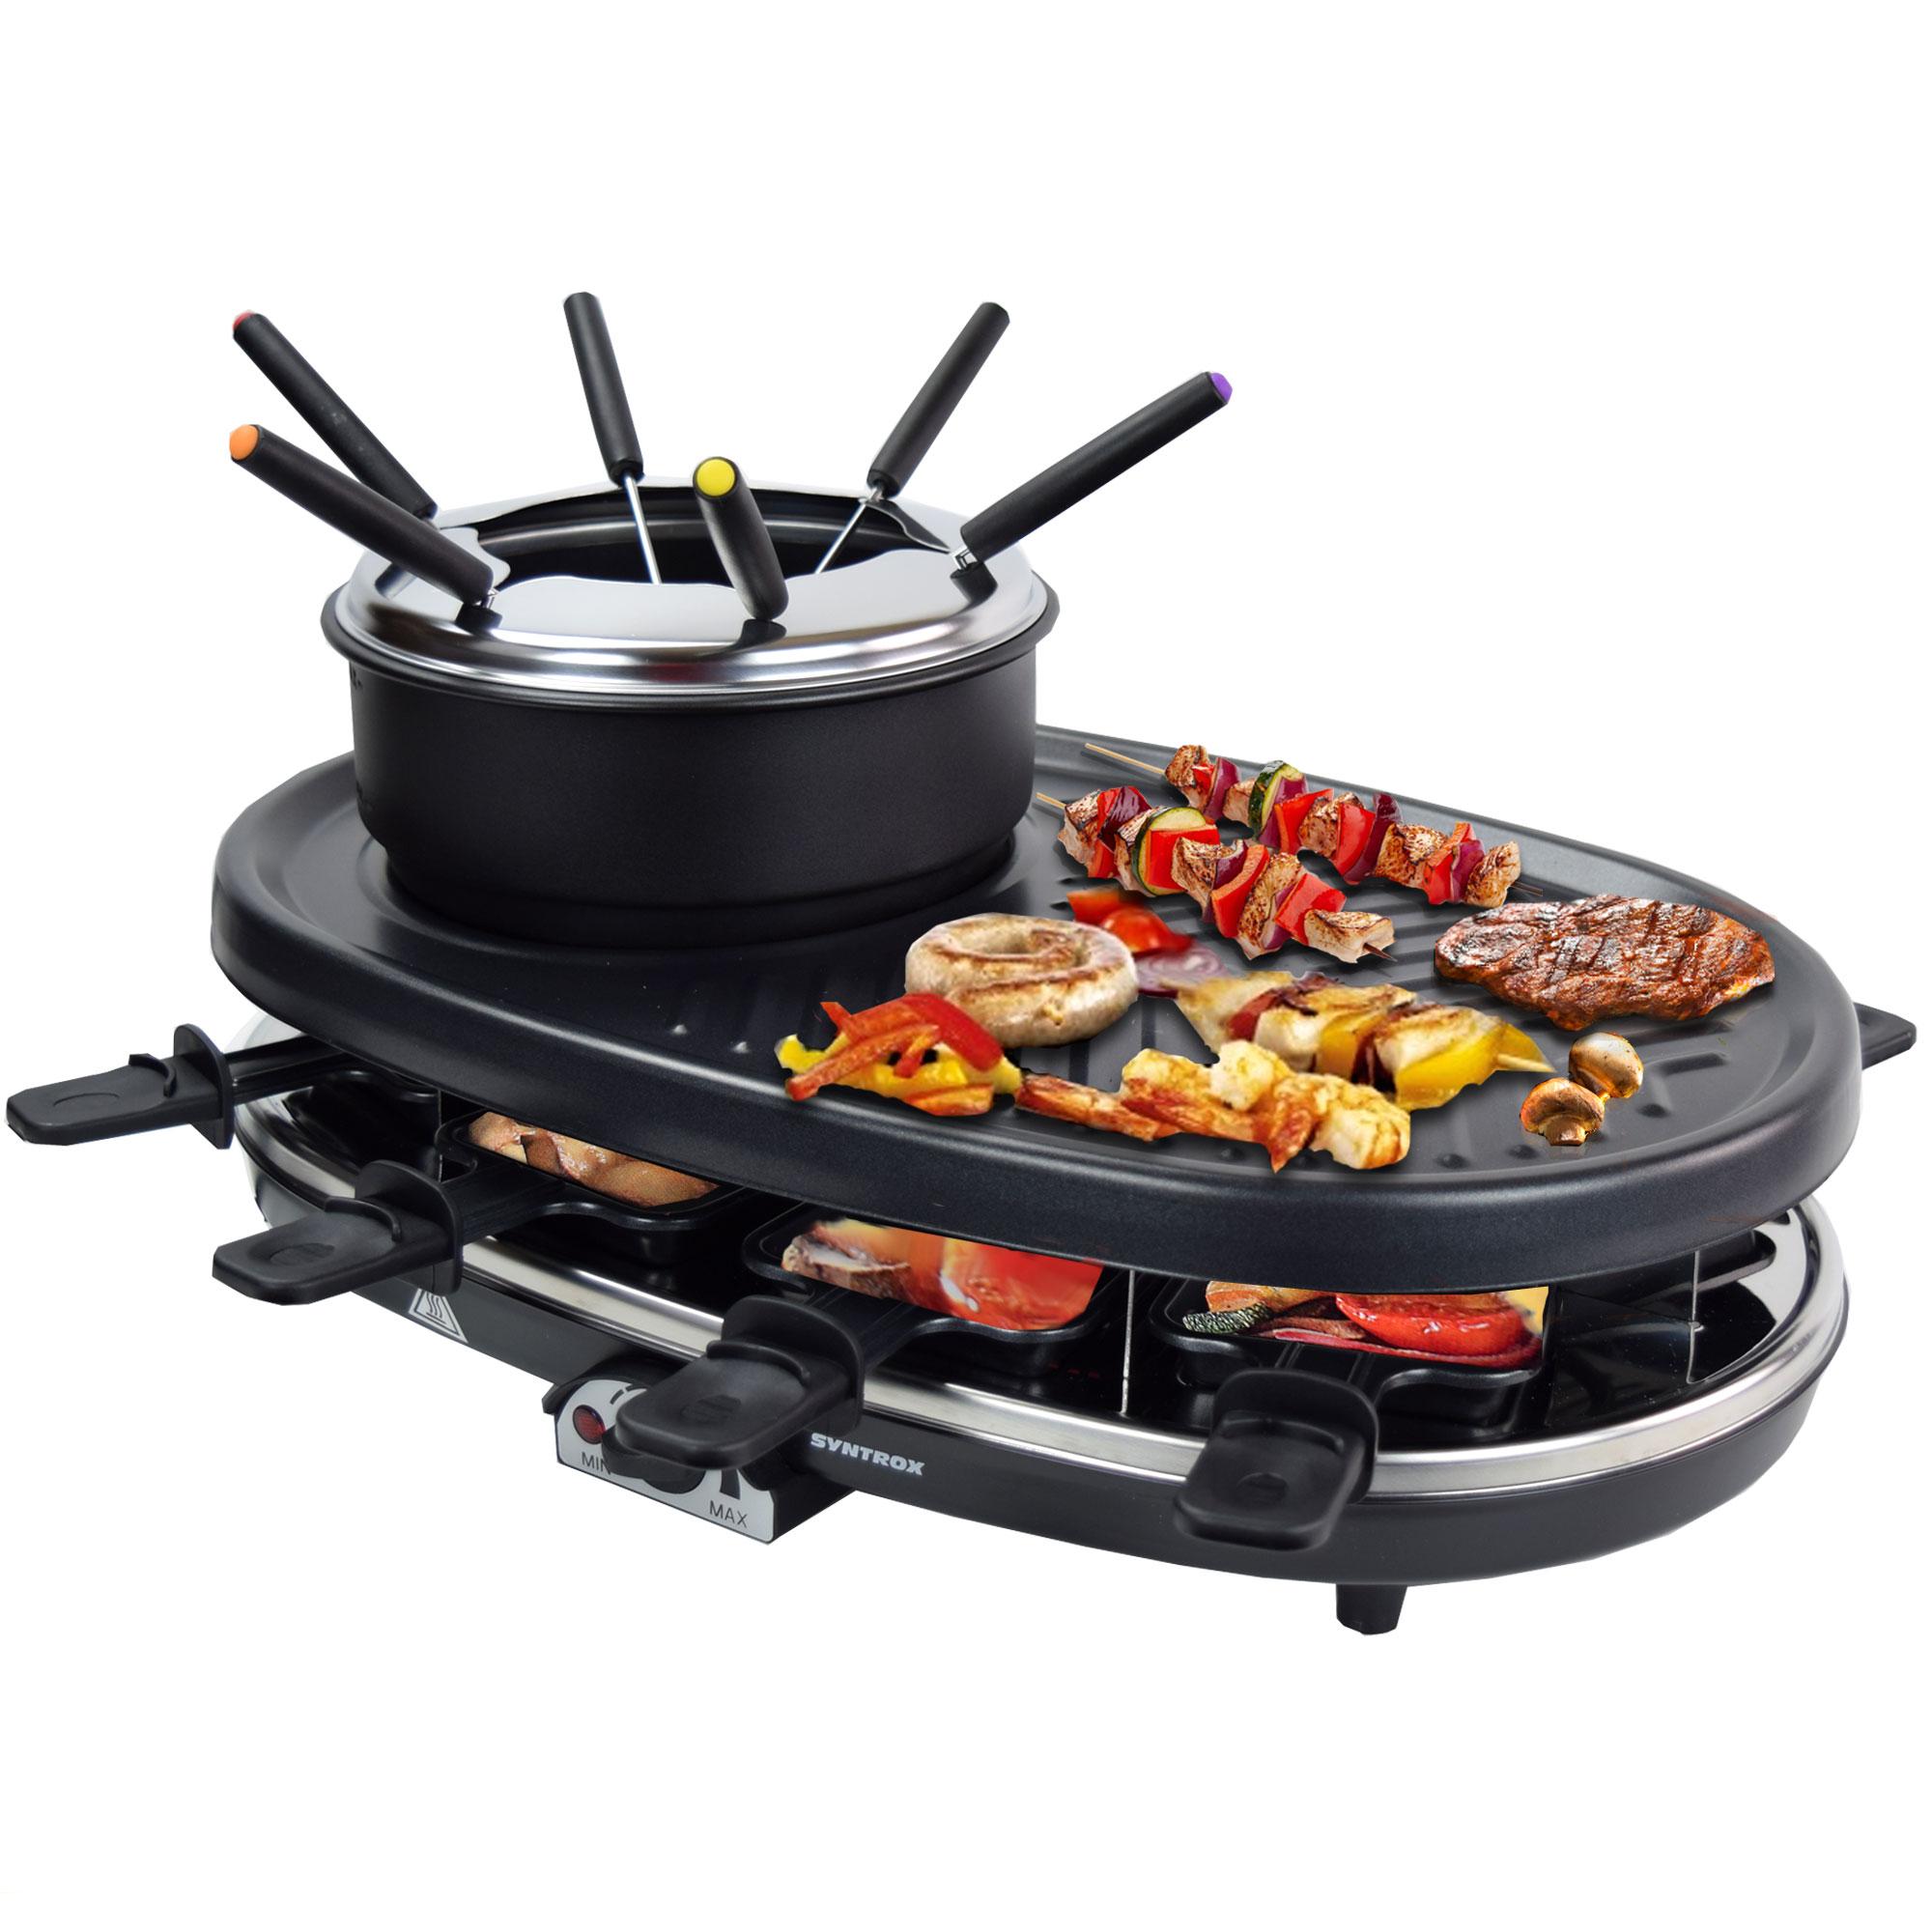 elektro raclette tischgrill grill grillplatte fondue mit 8. Black Bedroom Furniture Sets. Home Design Ideas